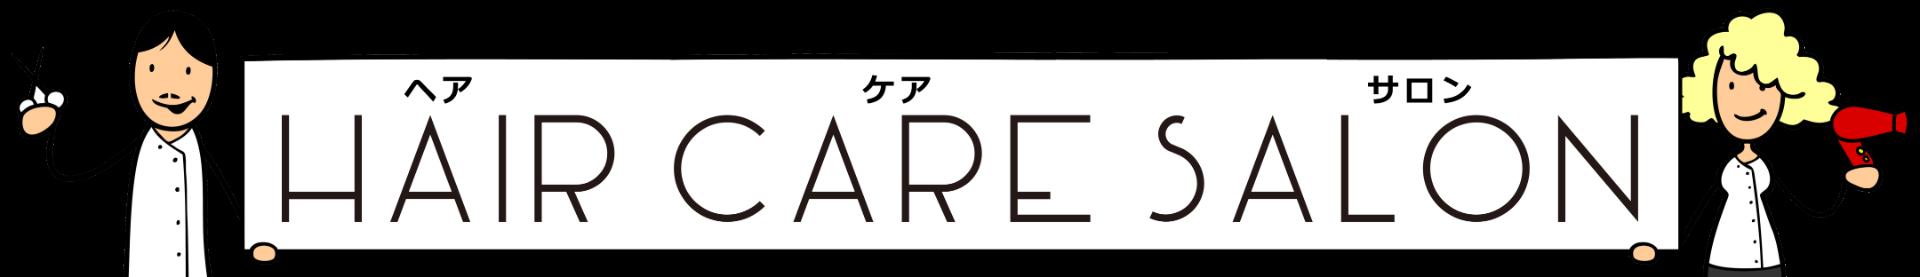 Hair Care Salon(ヘアケアサロン)|美容師が厳選した本当にオススメのシャンプー&関連商品をご紹介!!